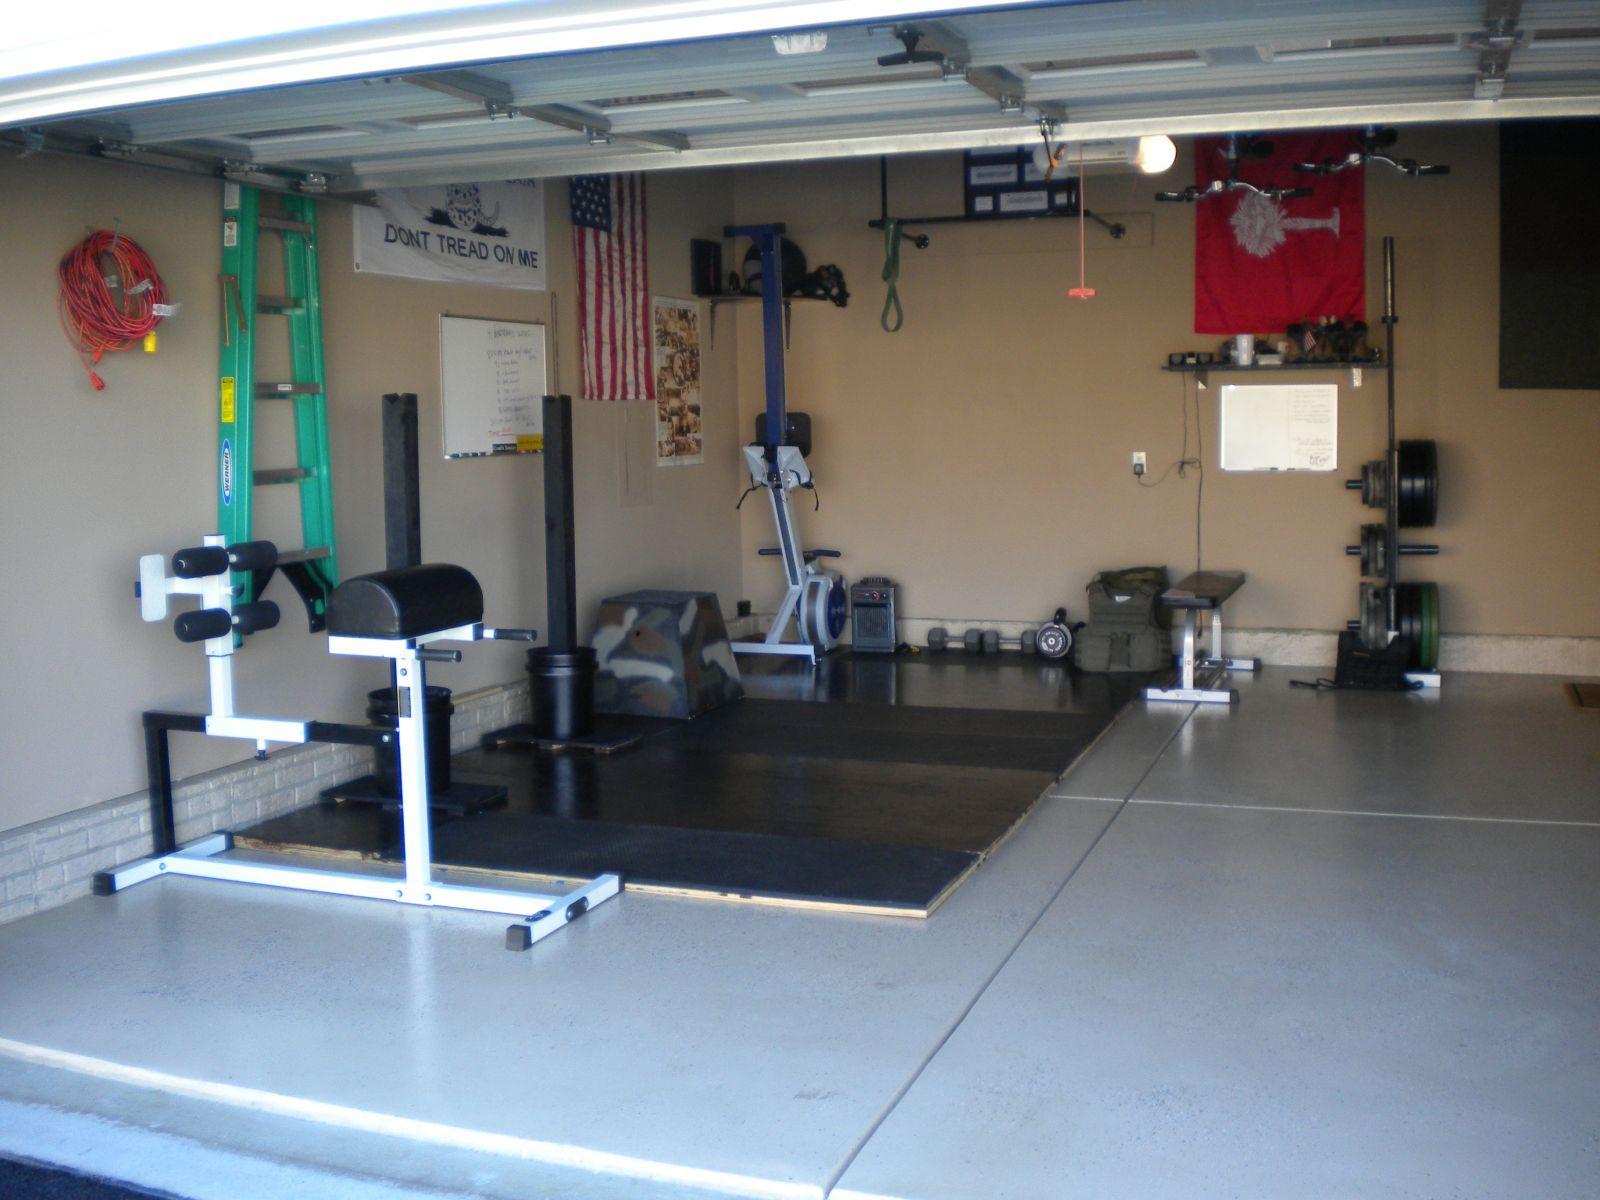 Best garage gyms year of clean water